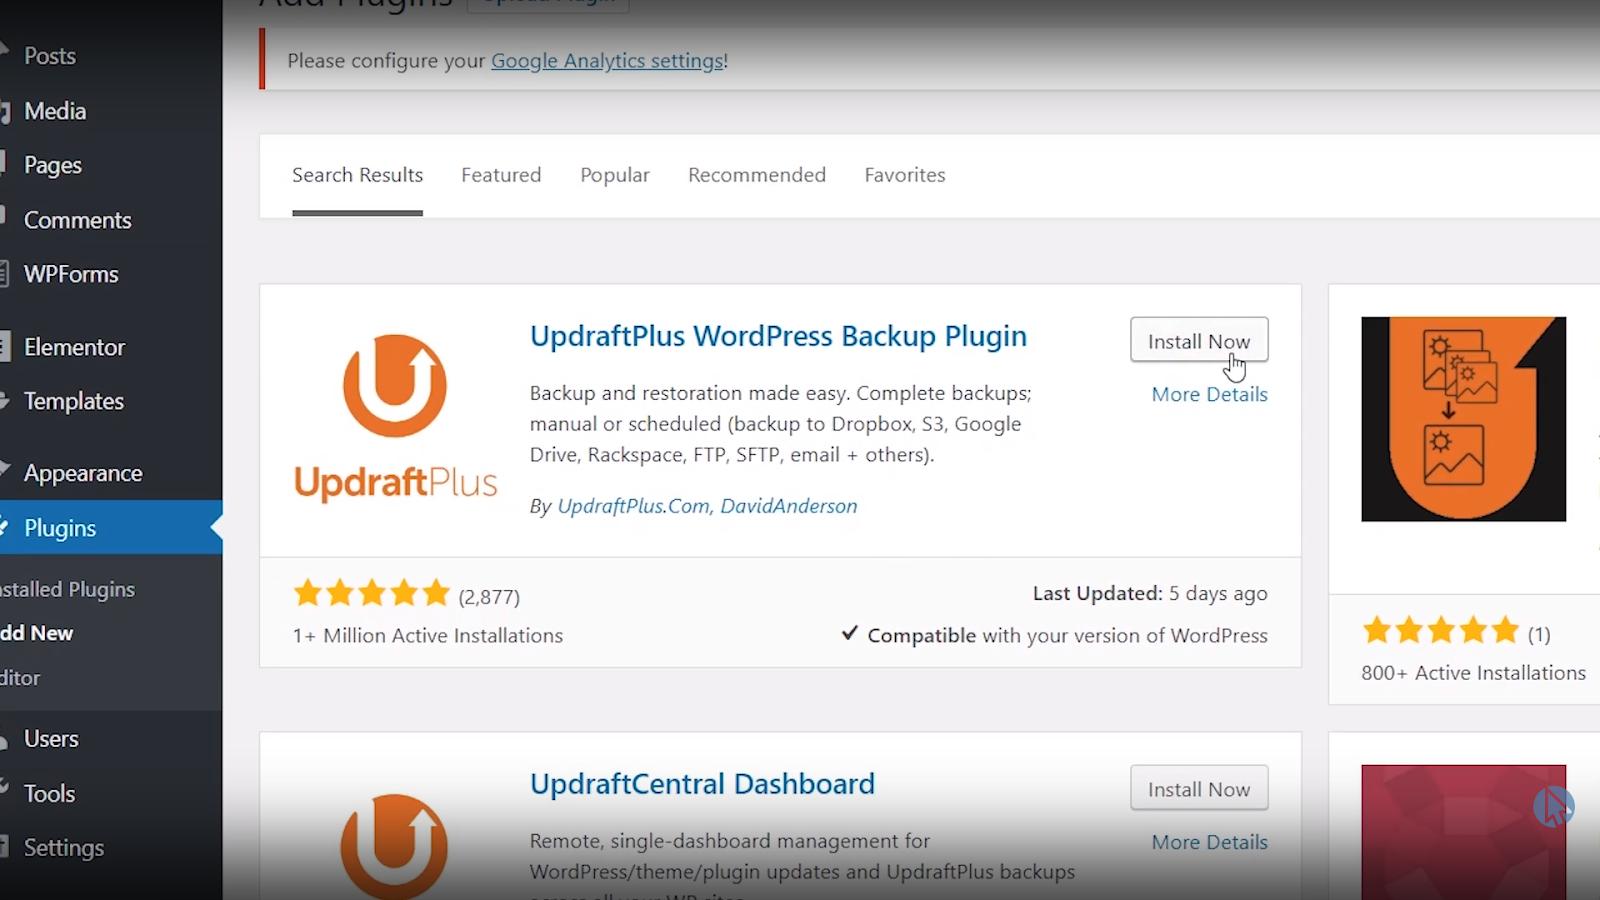 updraft plus wordpress backup plugin install